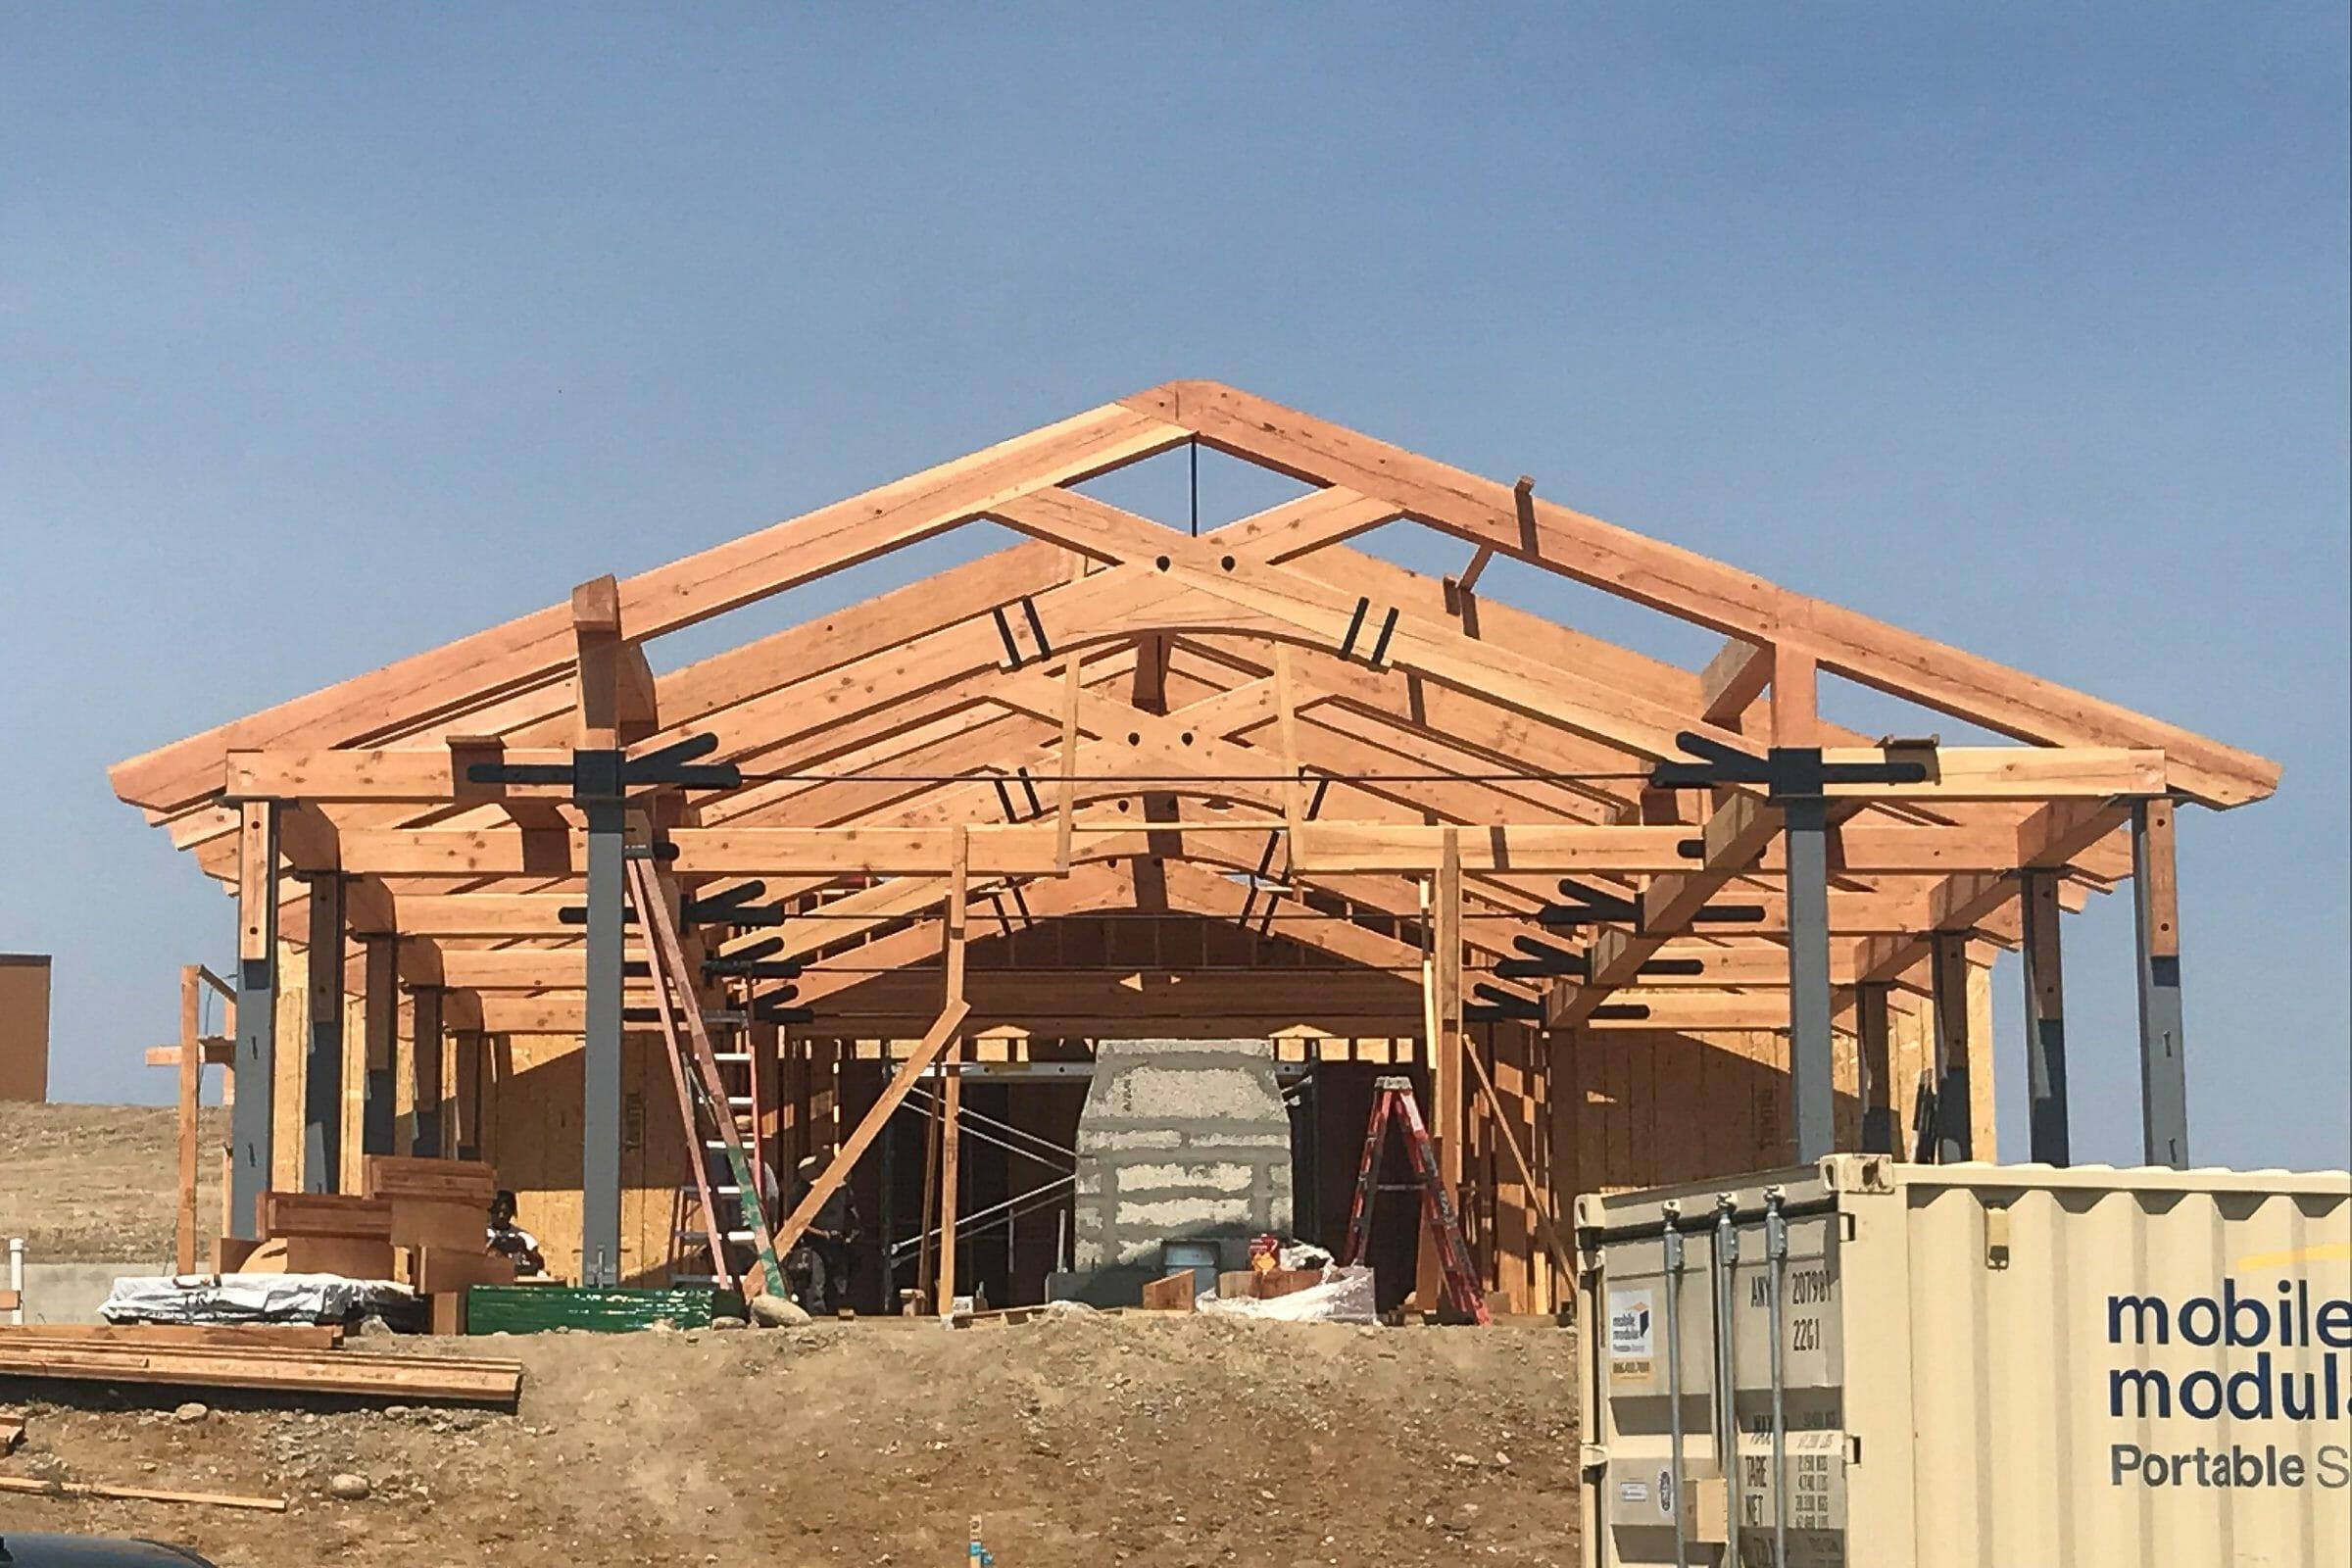 The Rancho Santa Fe Pavilion in Rancho Santa Fe California